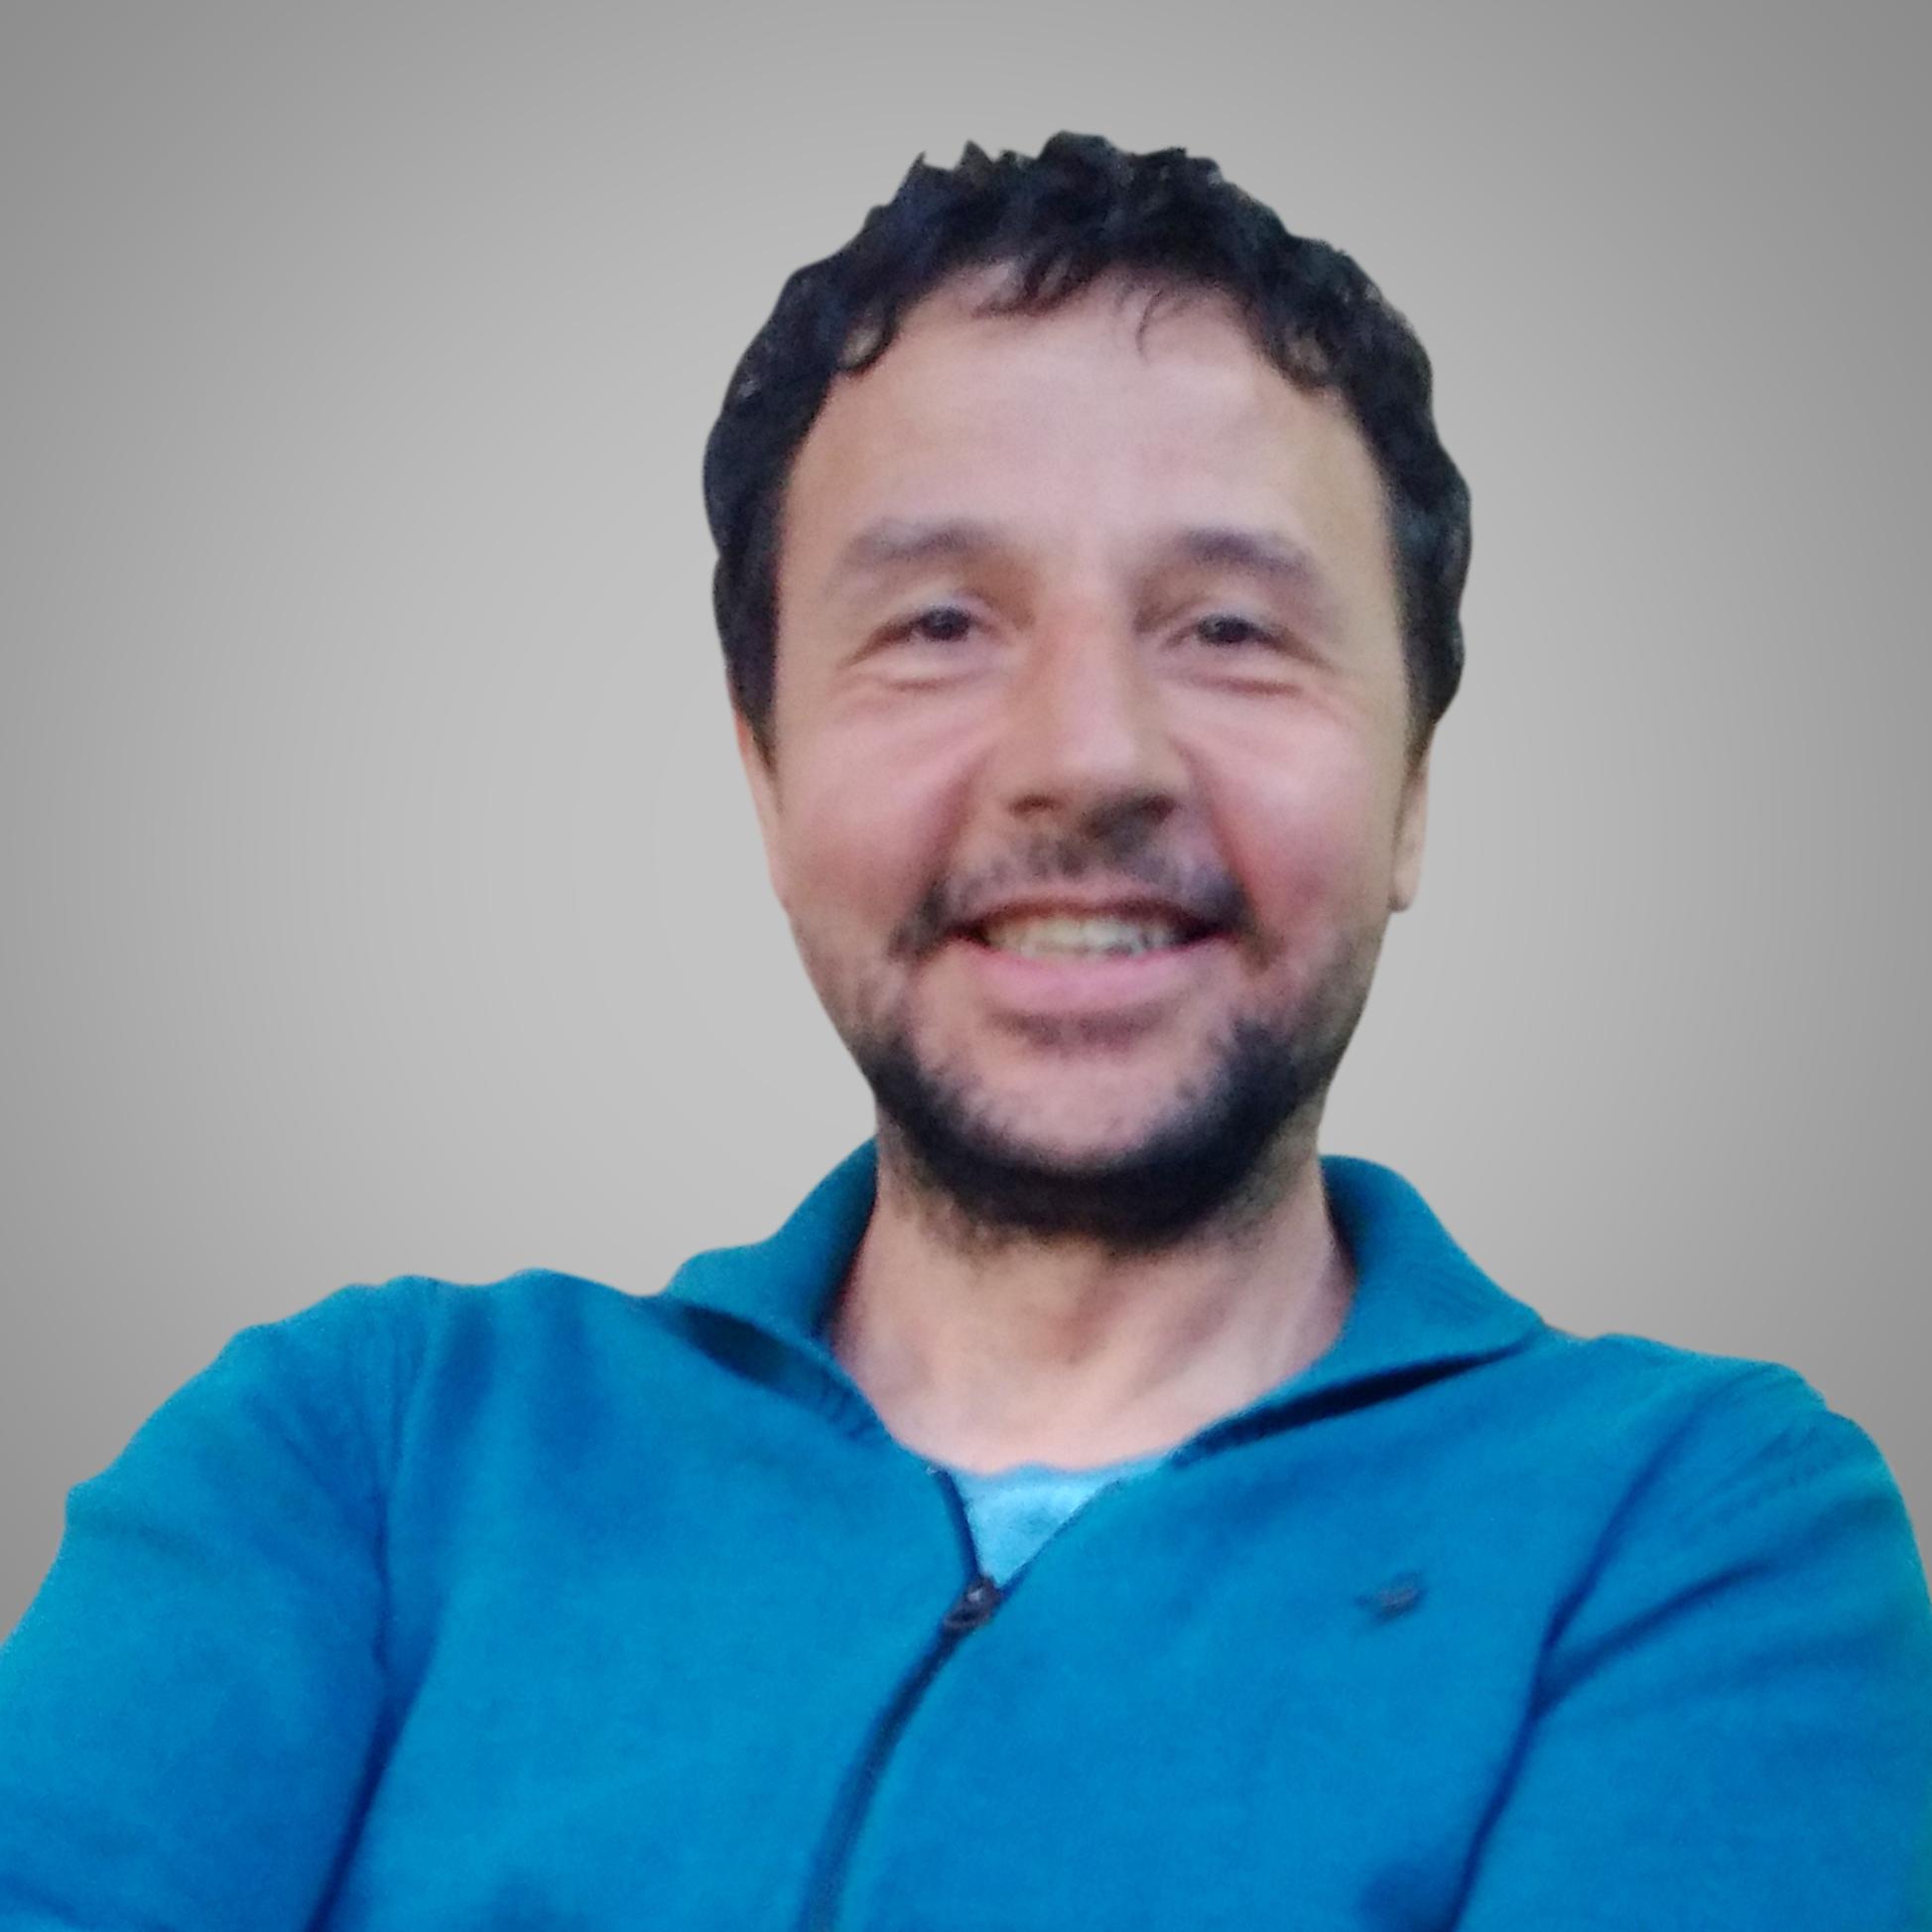 Nikola Pejovic